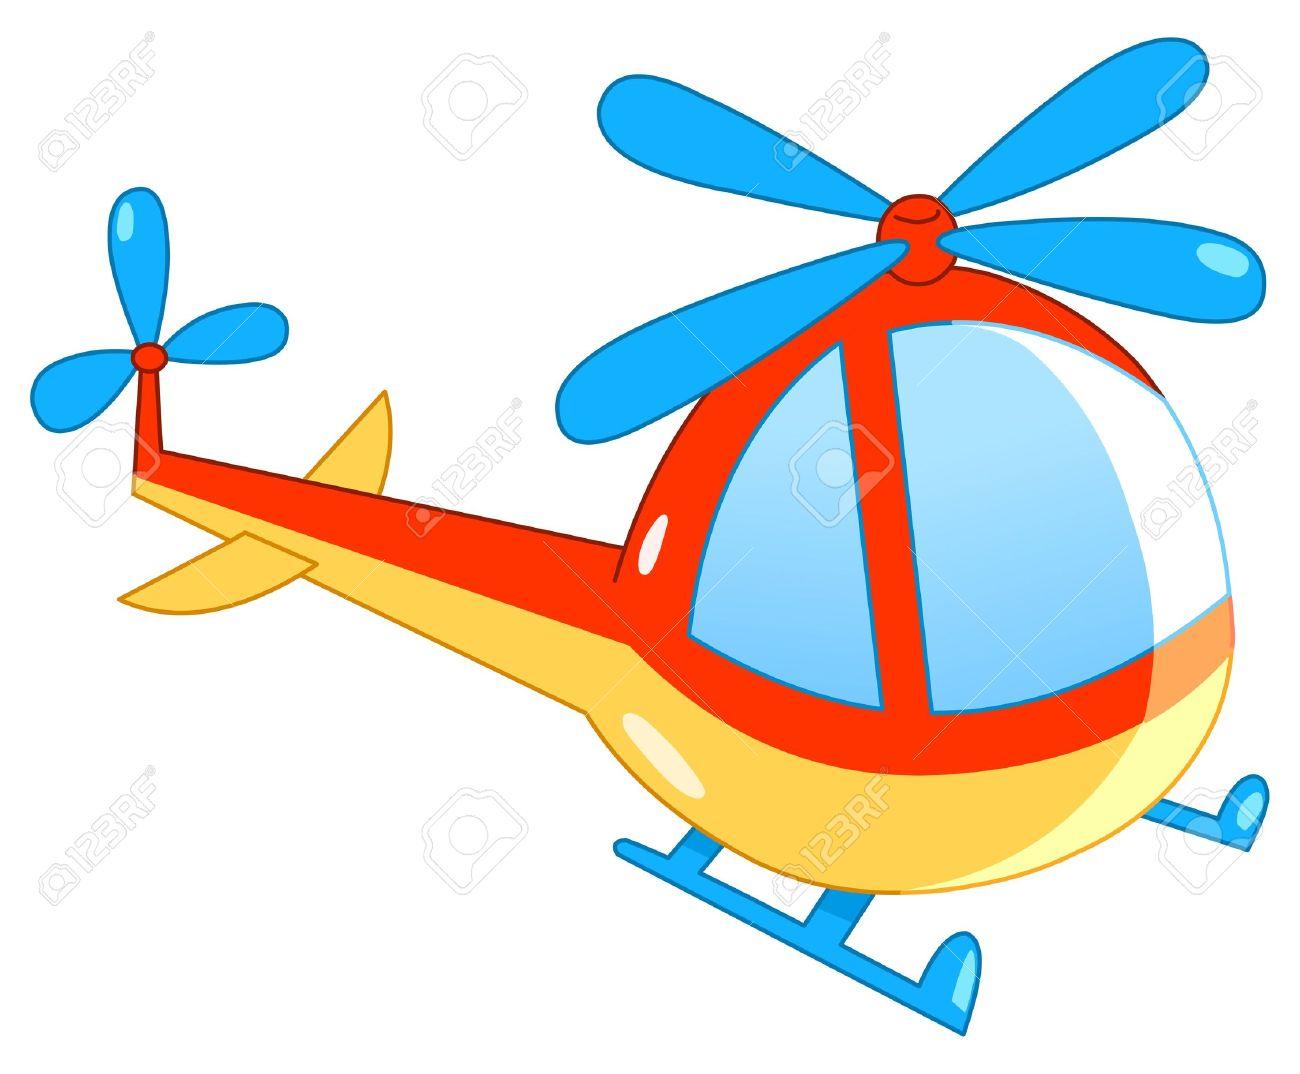 Helicopter cartoon Stock Vector - 9217660